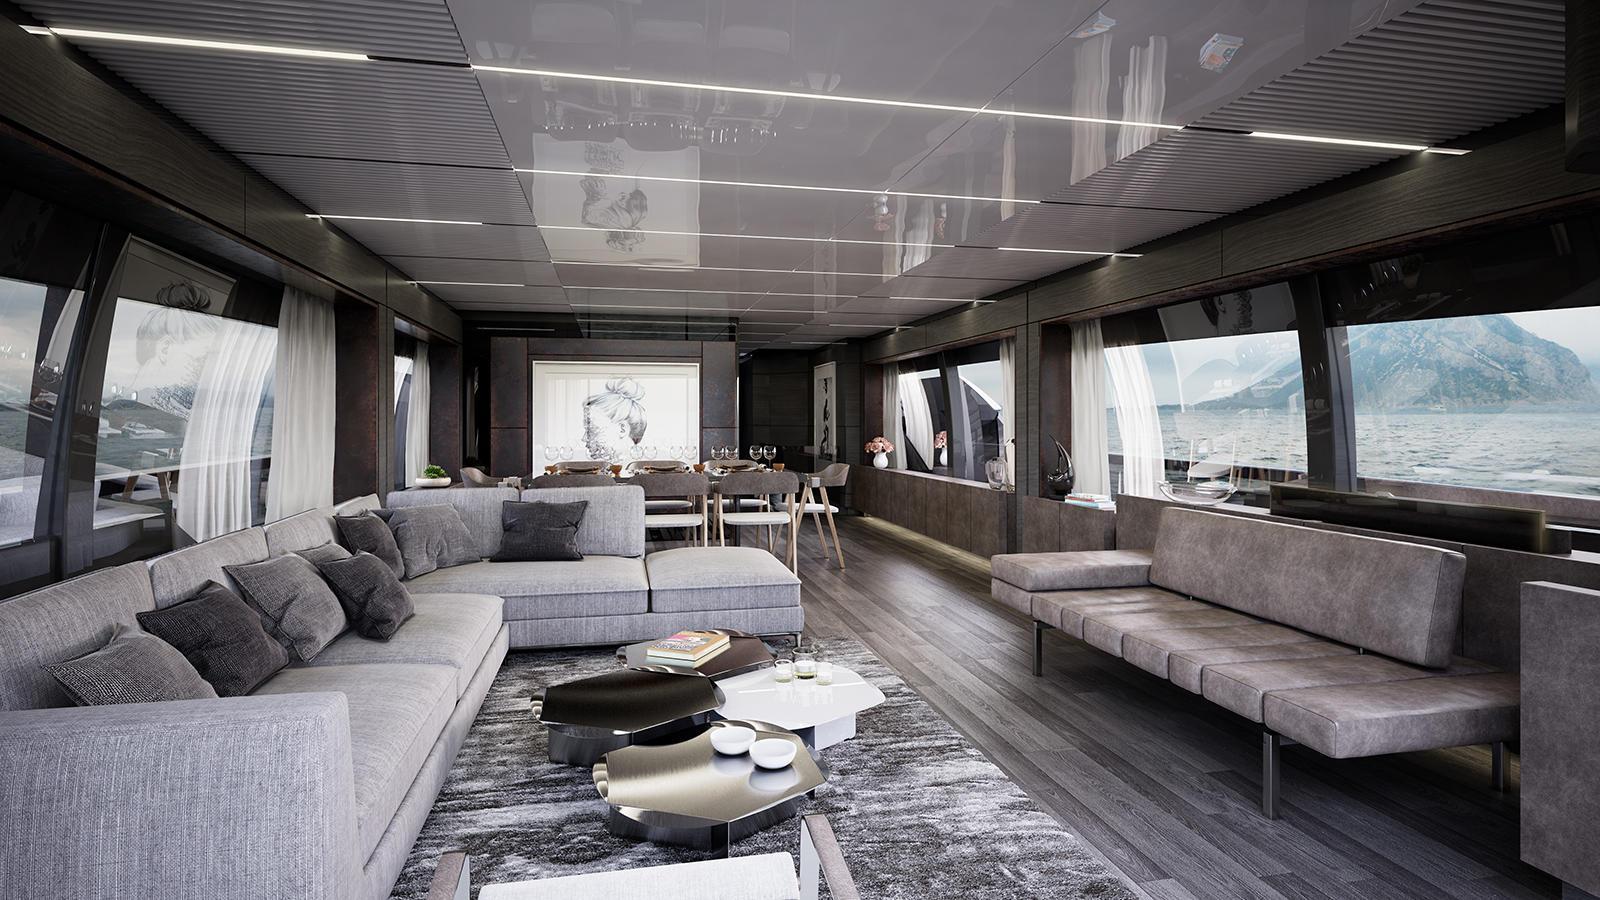 Ferretti 920 motoryacht Ferretti 29m 2018 saloon sistership